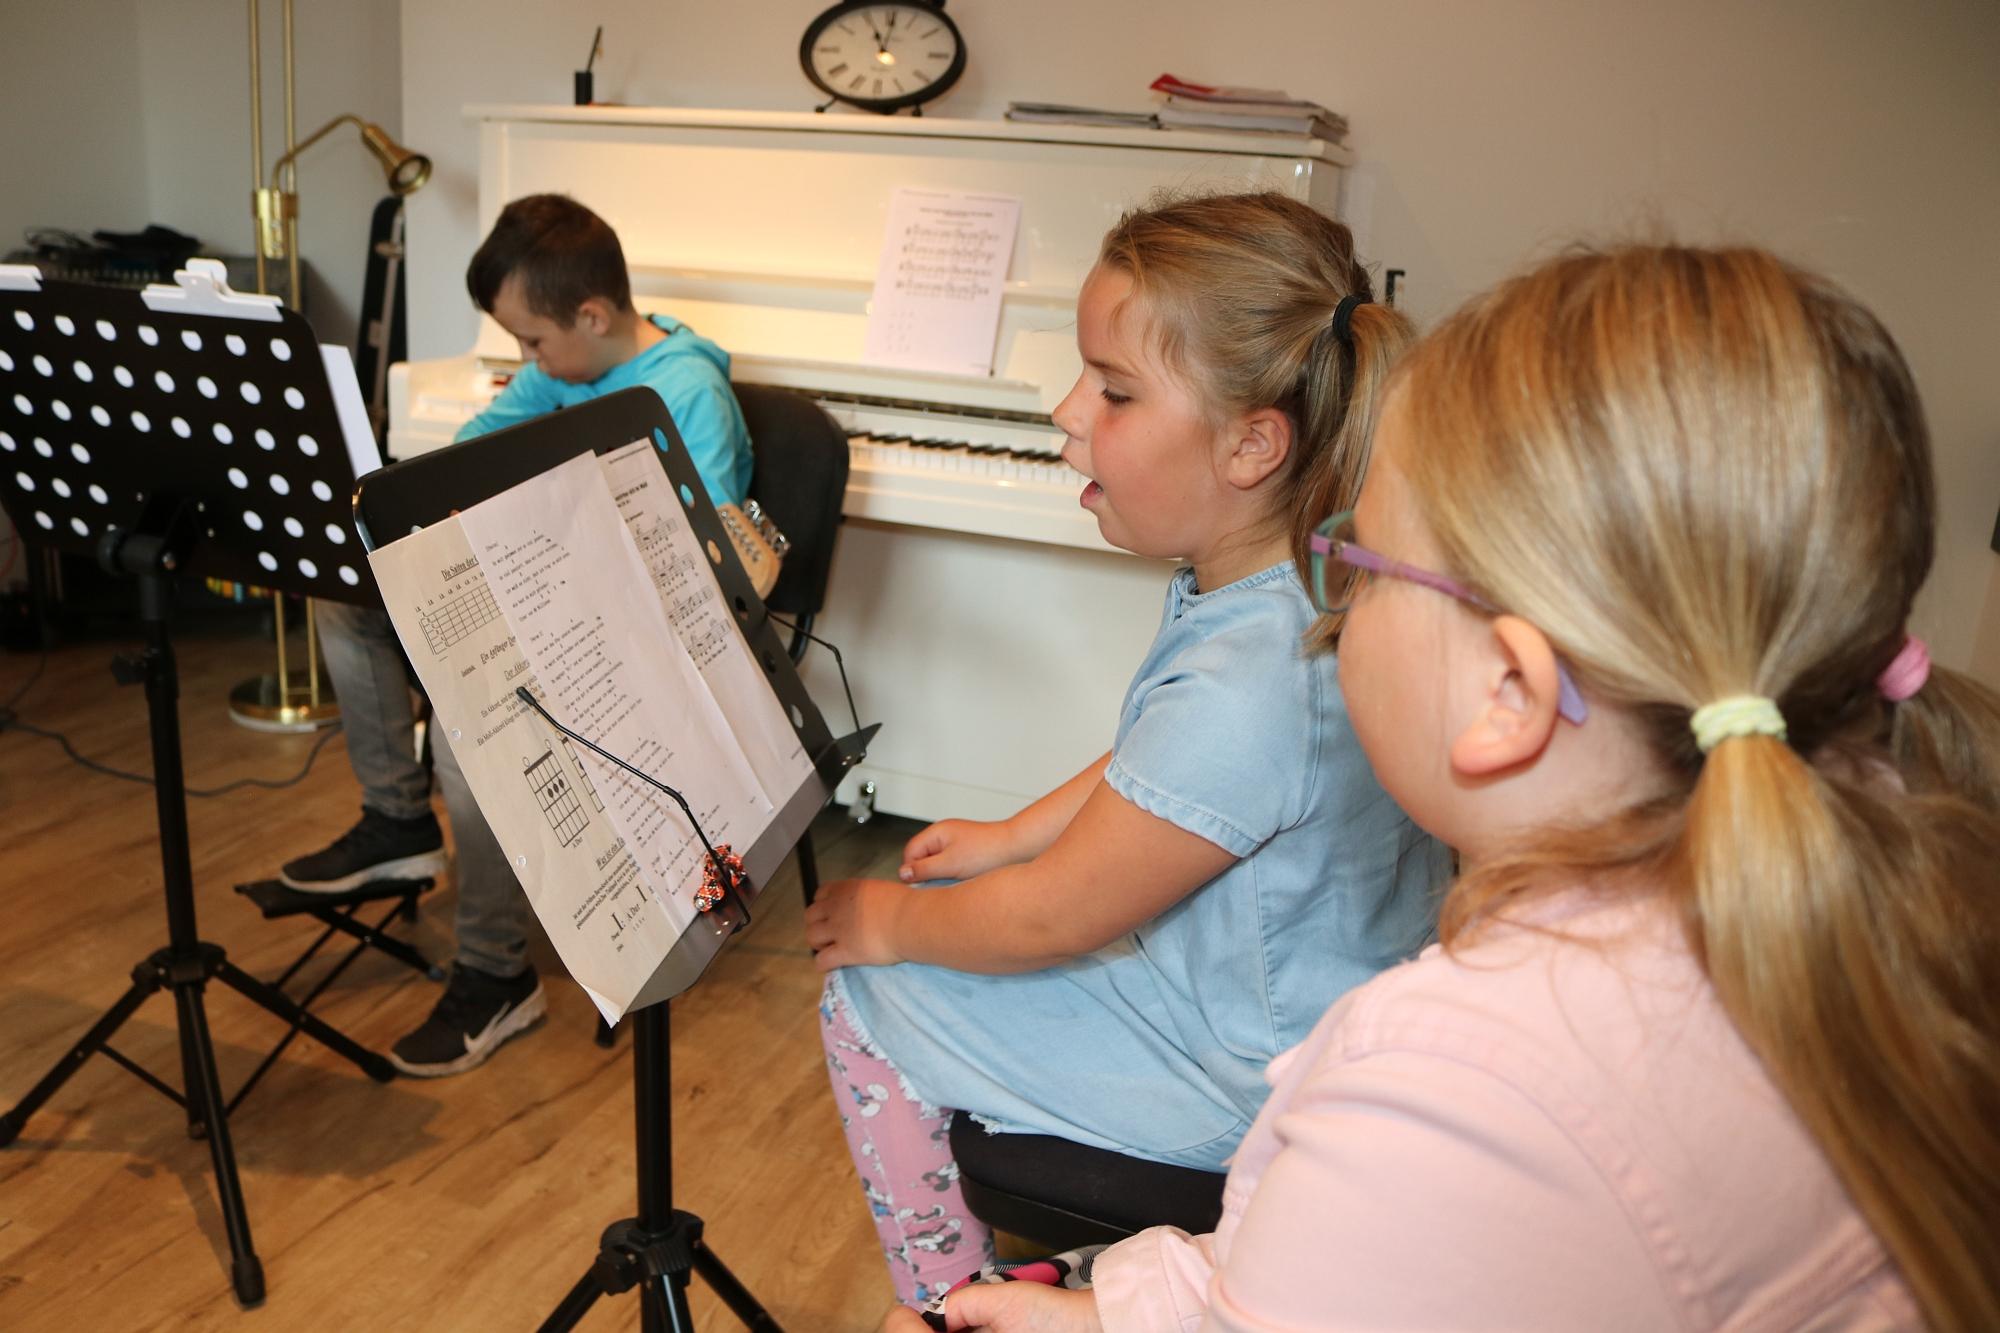 202007 Bandprobe FP Musikschule Harmonie 4